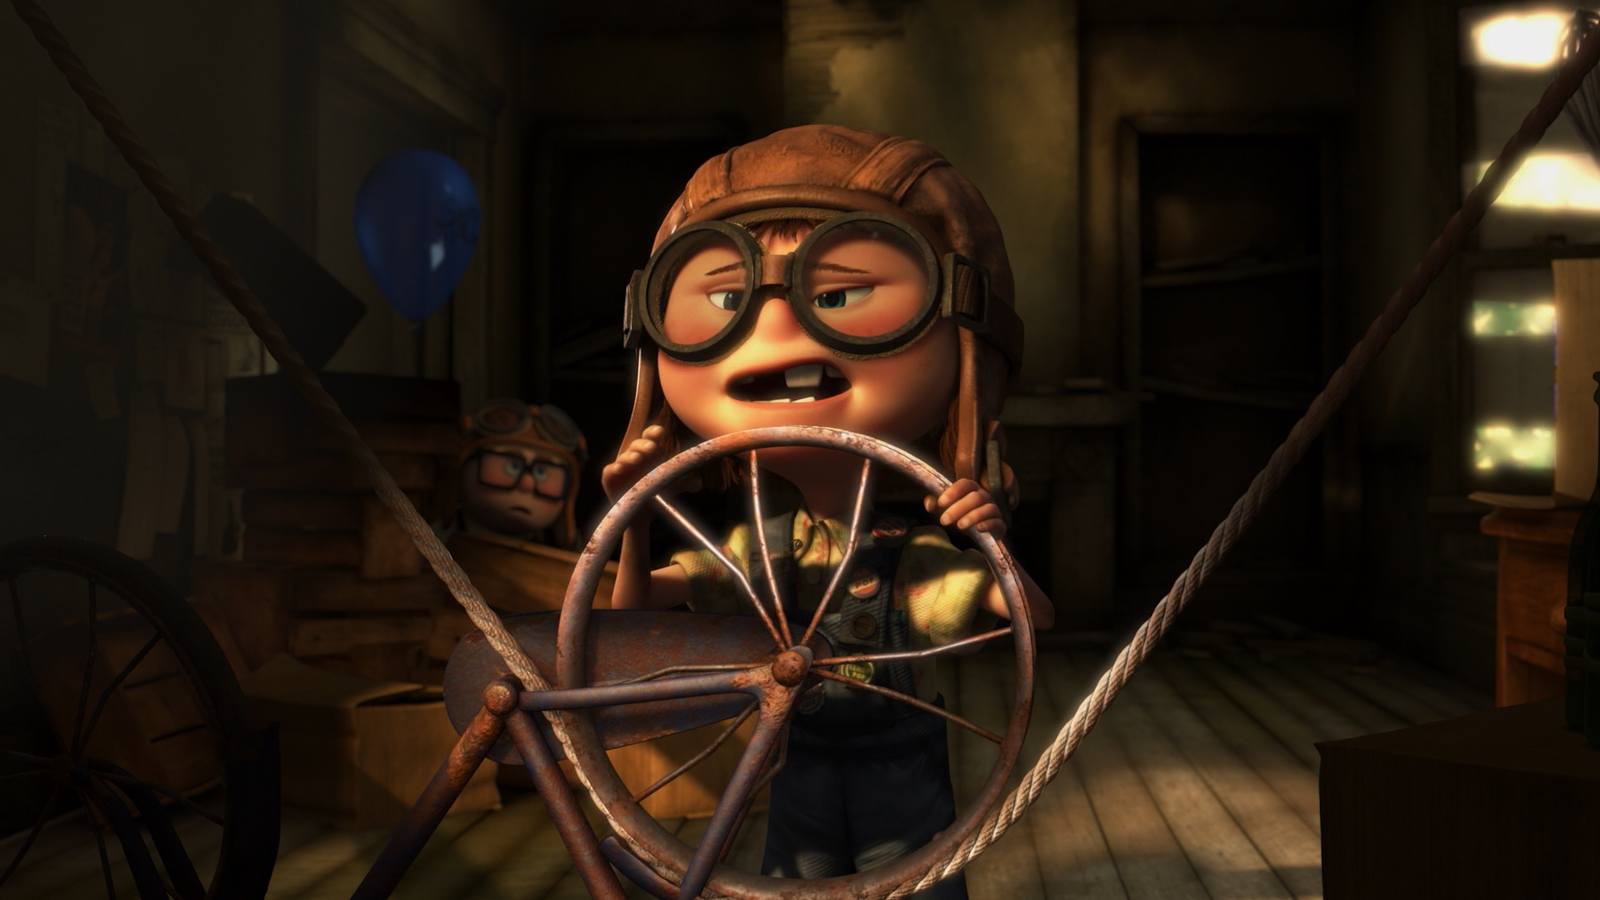 UP 3D Movie Pixar Studios HD Wallpapers Cartoon Wallpapers 1600x900